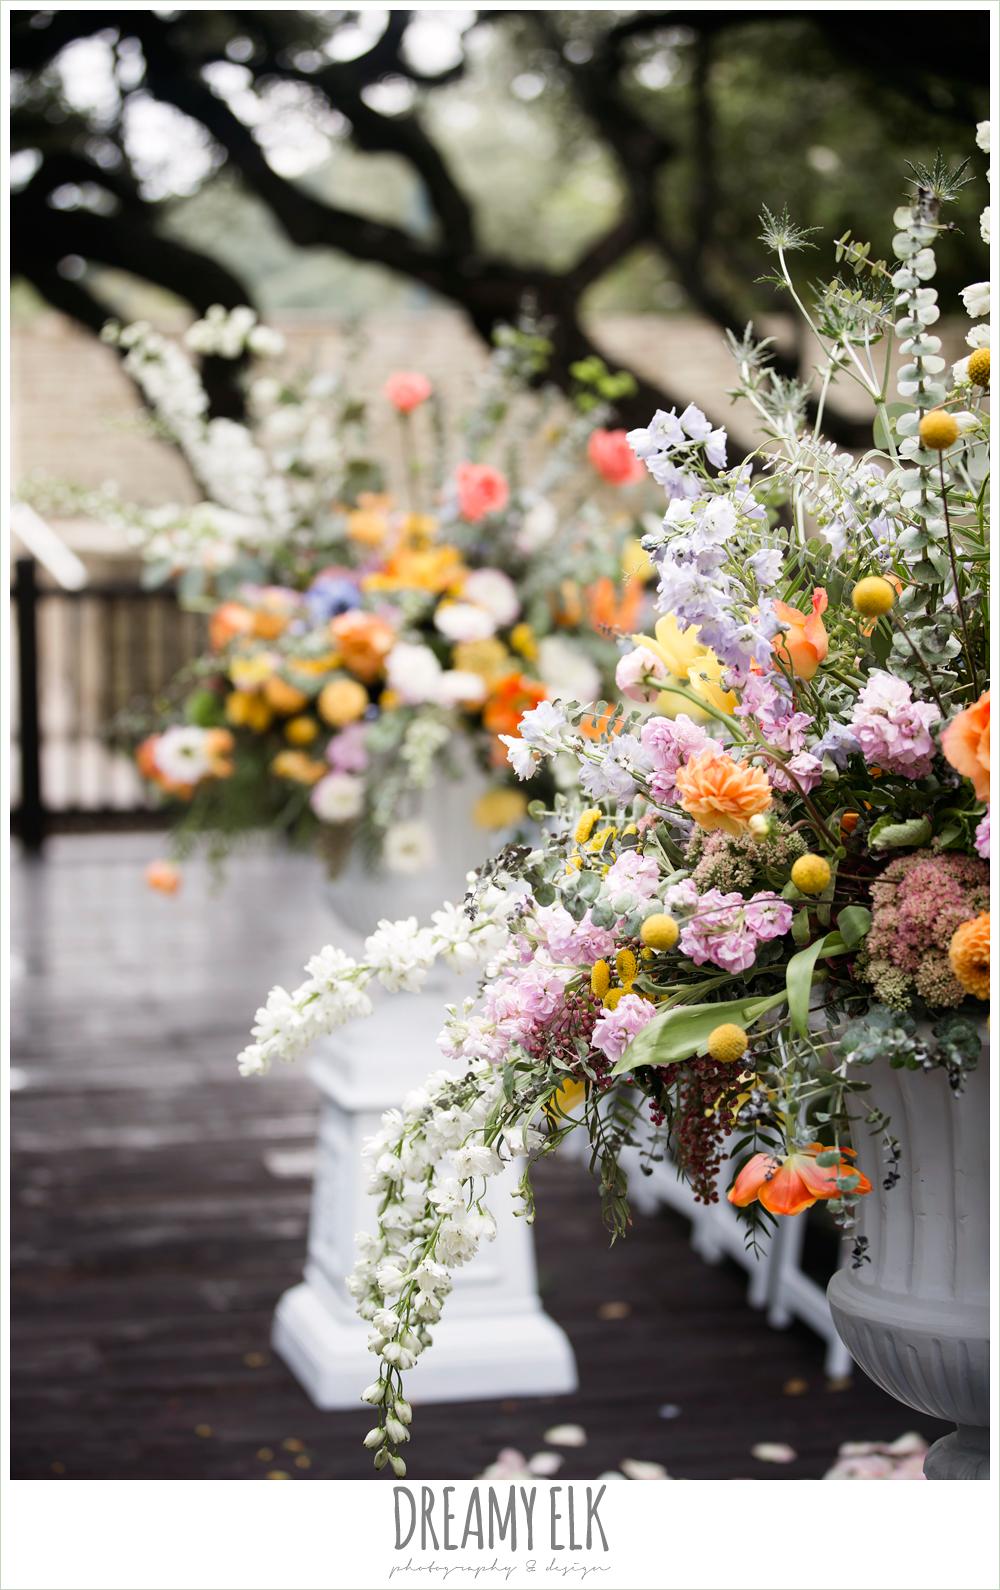 Plans n' Petals wedding bouquet, ceremony altar flowers, colorful outdoor sunday morning brunch wedding, hyatt hill country club, san antonio wedding photo {dreamy elk photography and design}